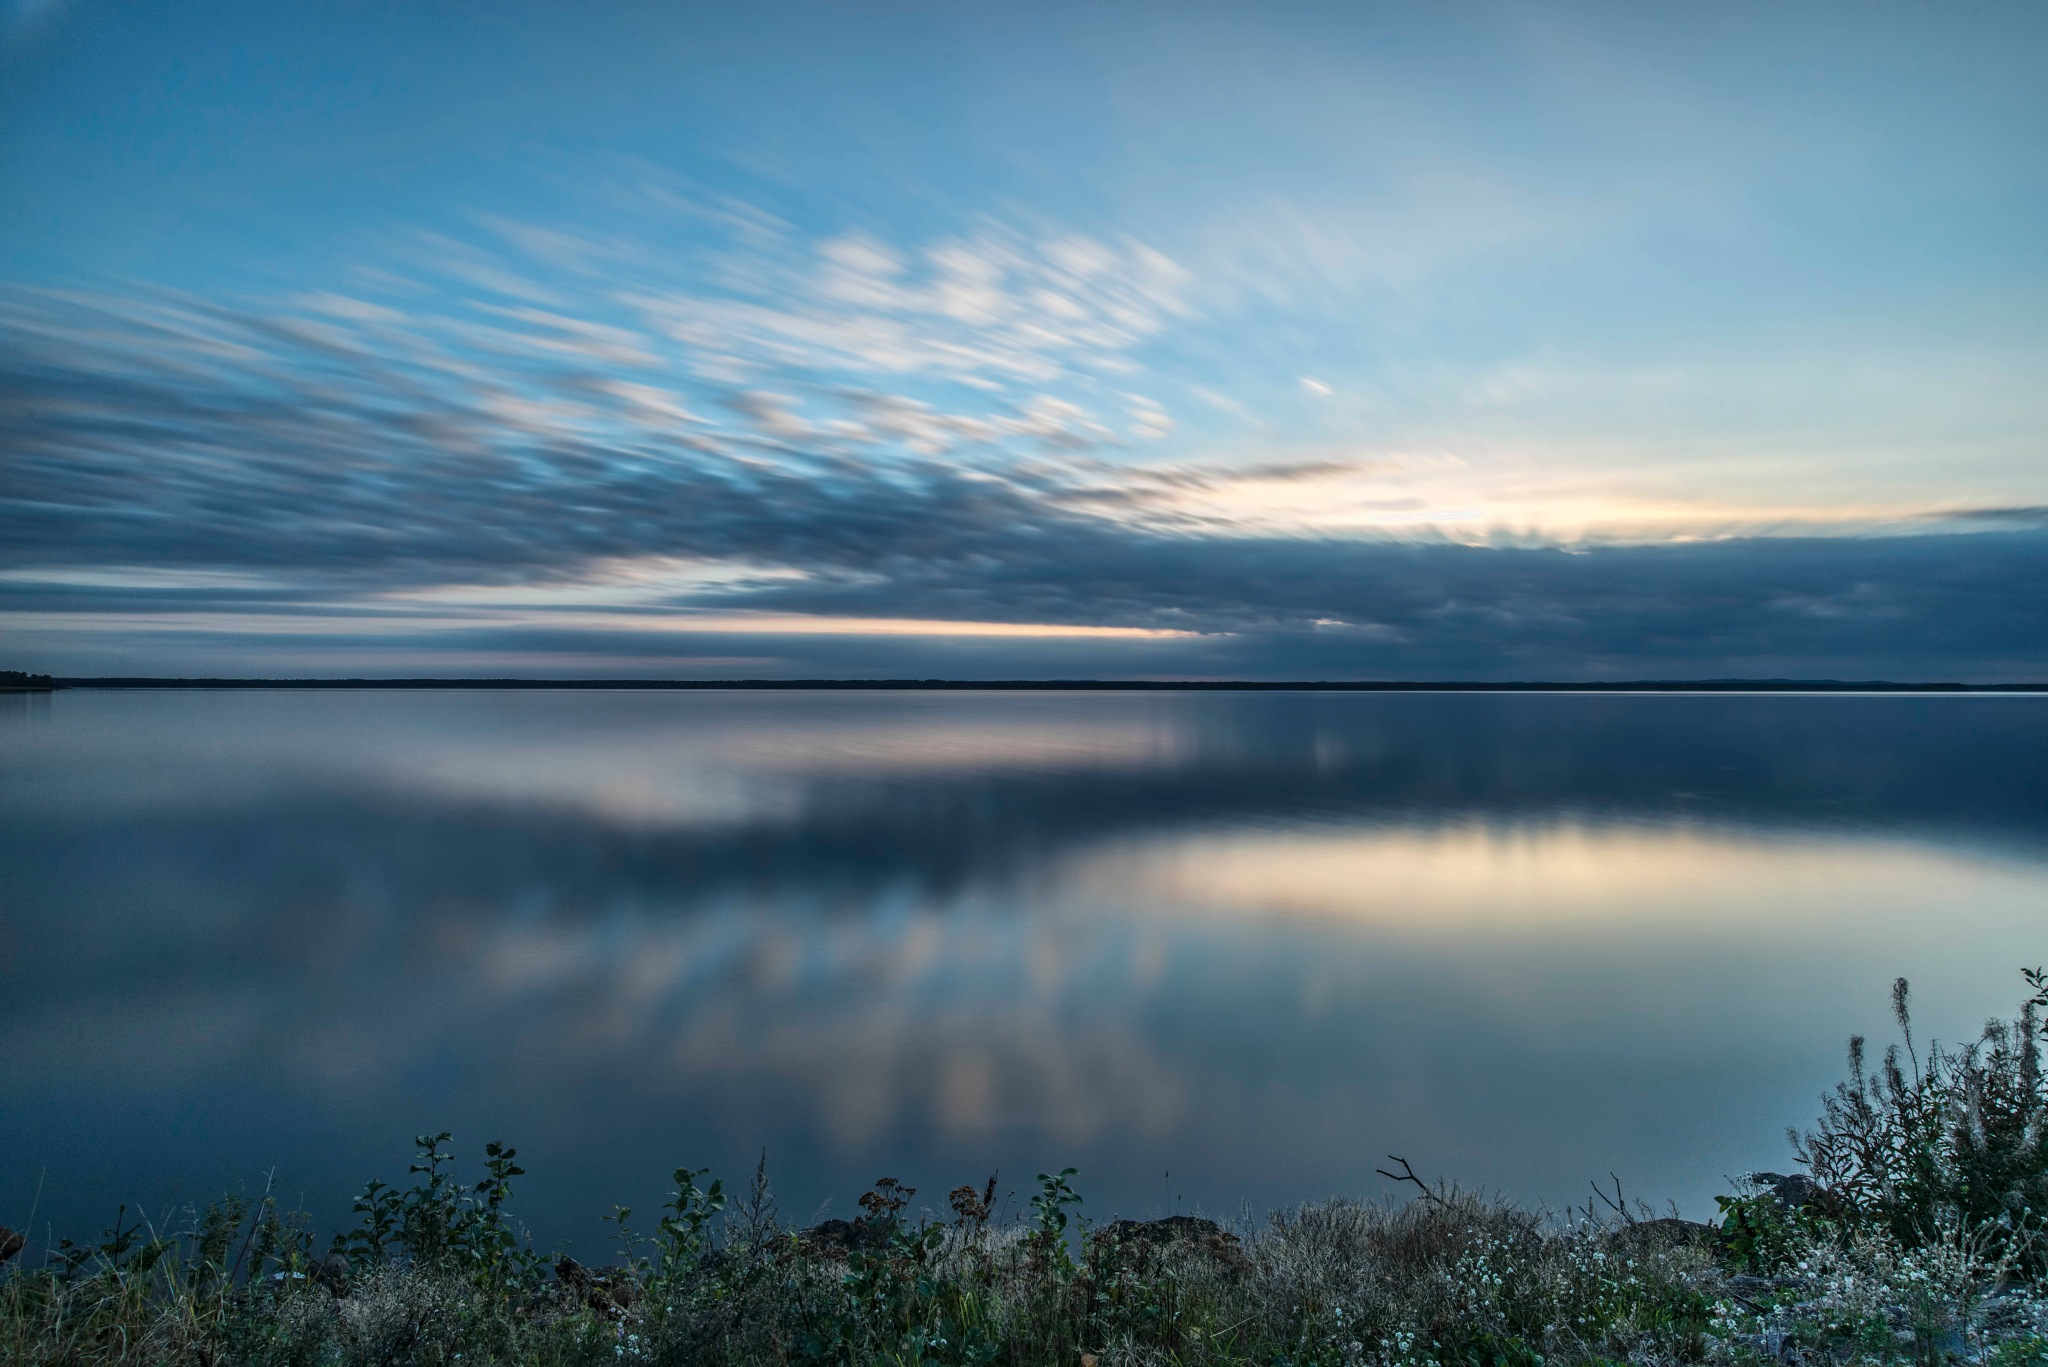 Sunset behind clouds by Jörgen Lindgren